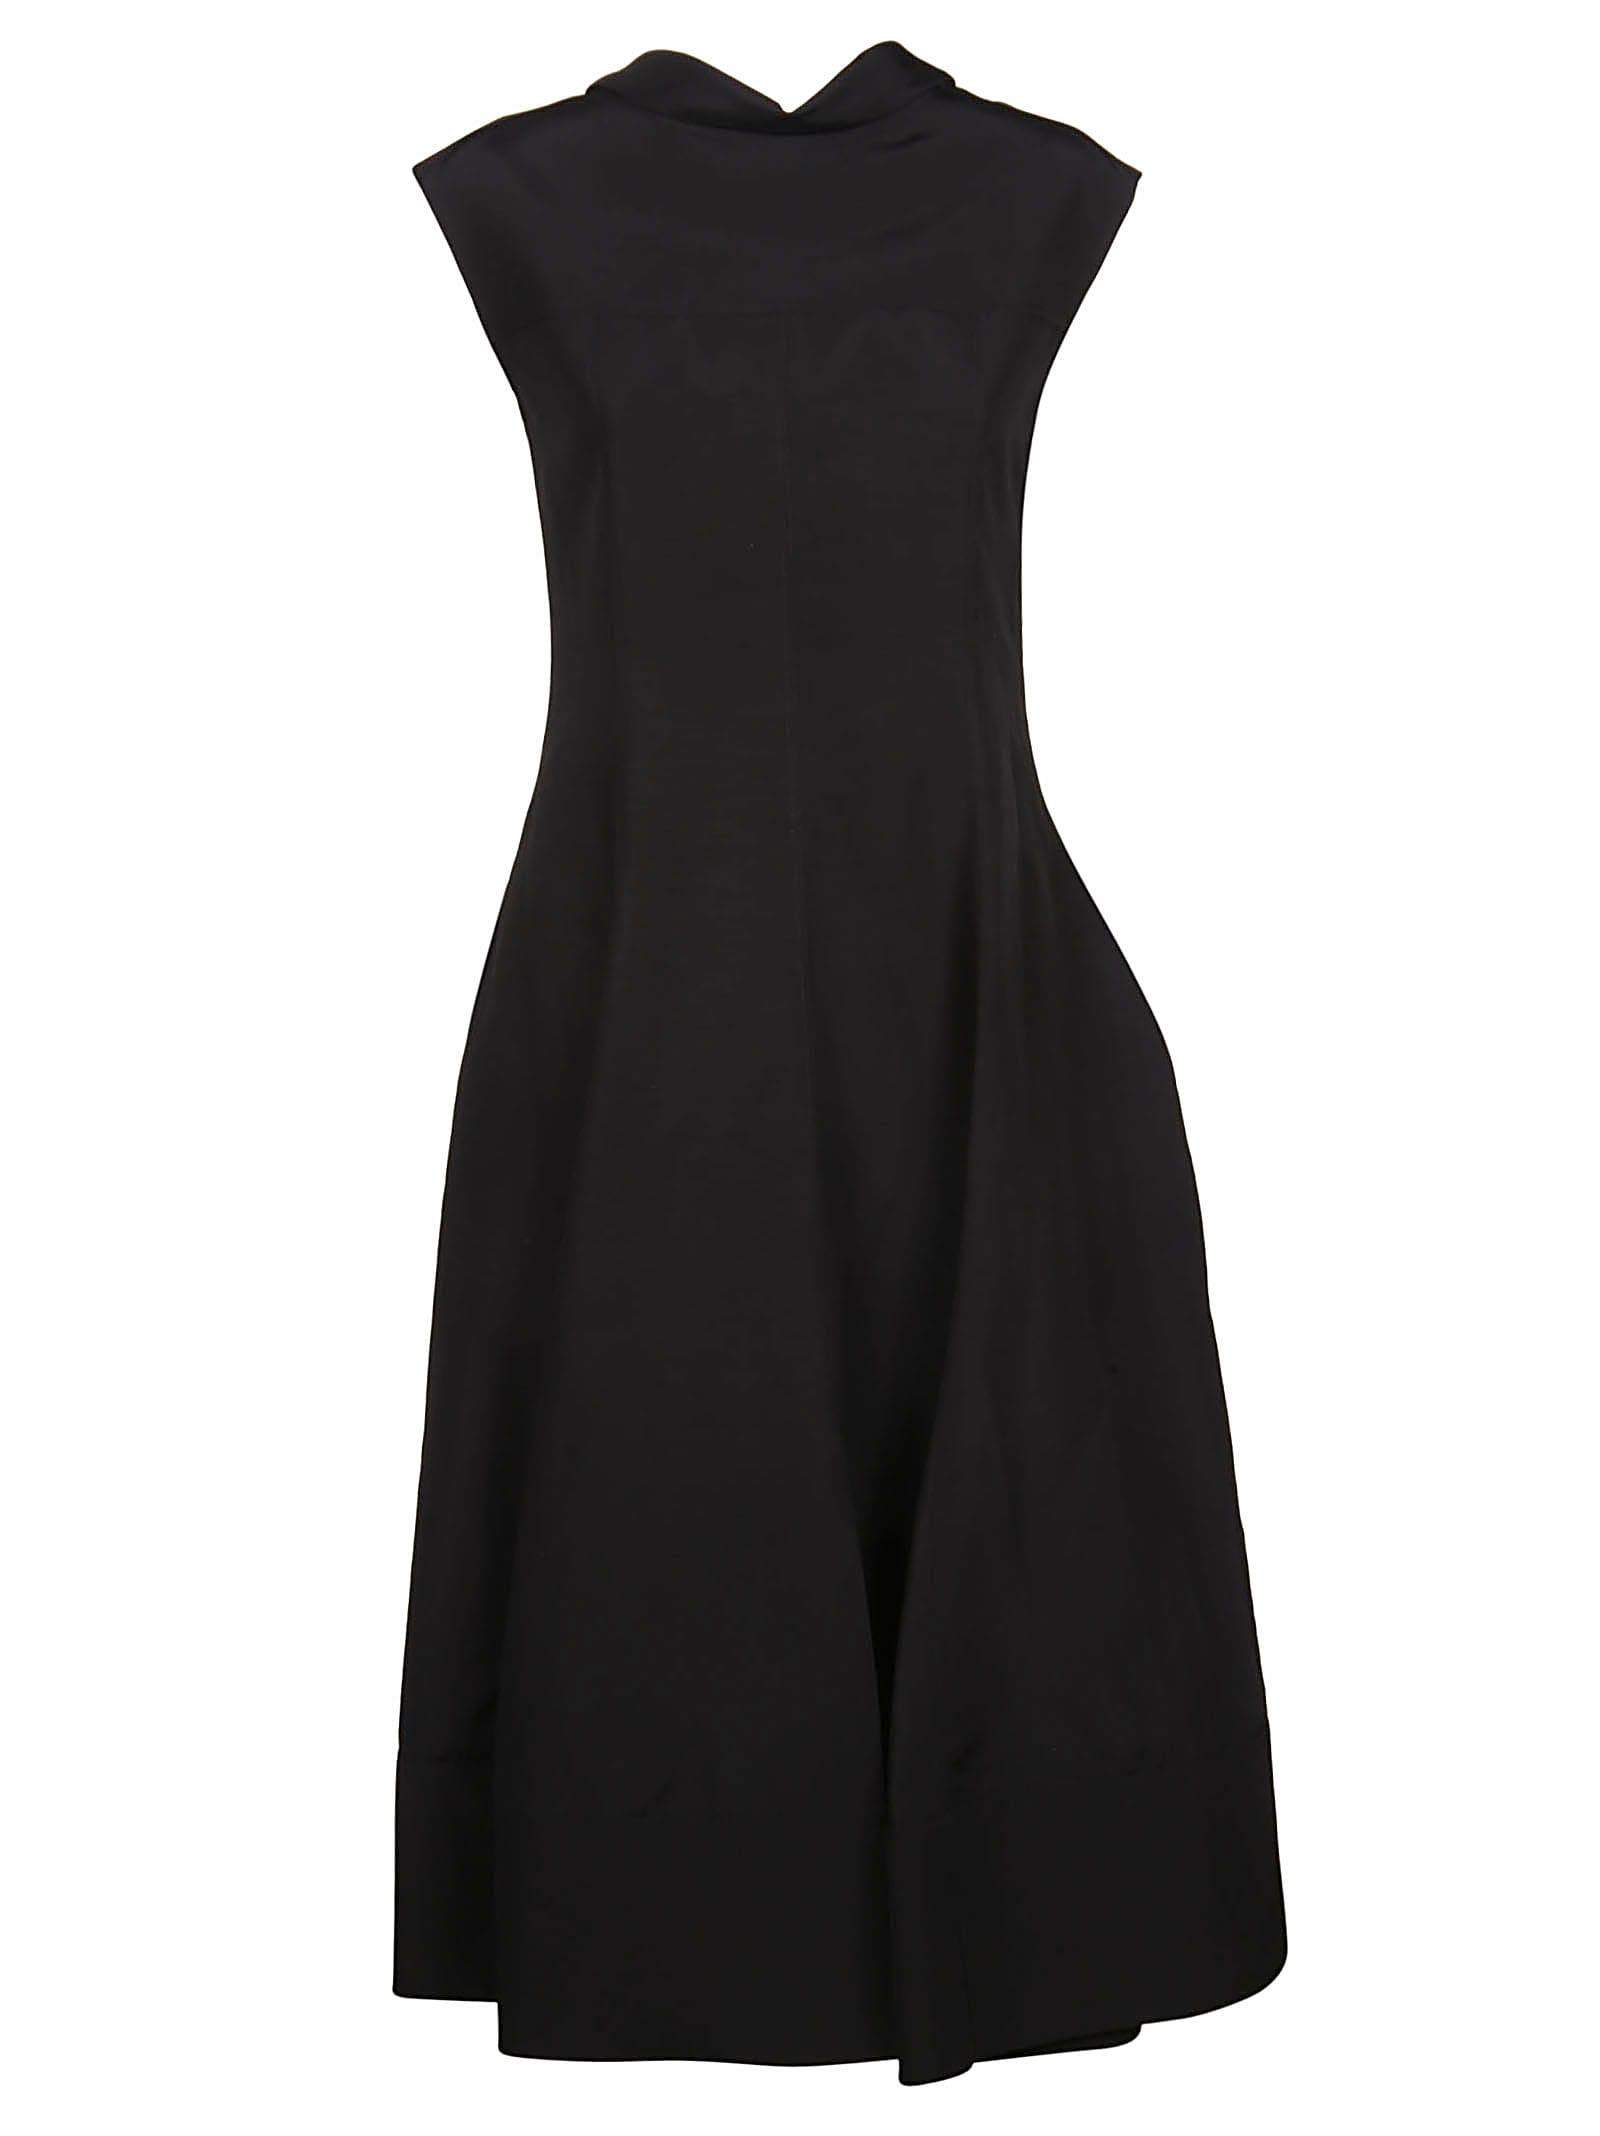 Buy Jil Sander Puff Skirt Dress online, shop Jil Sander with free shipping